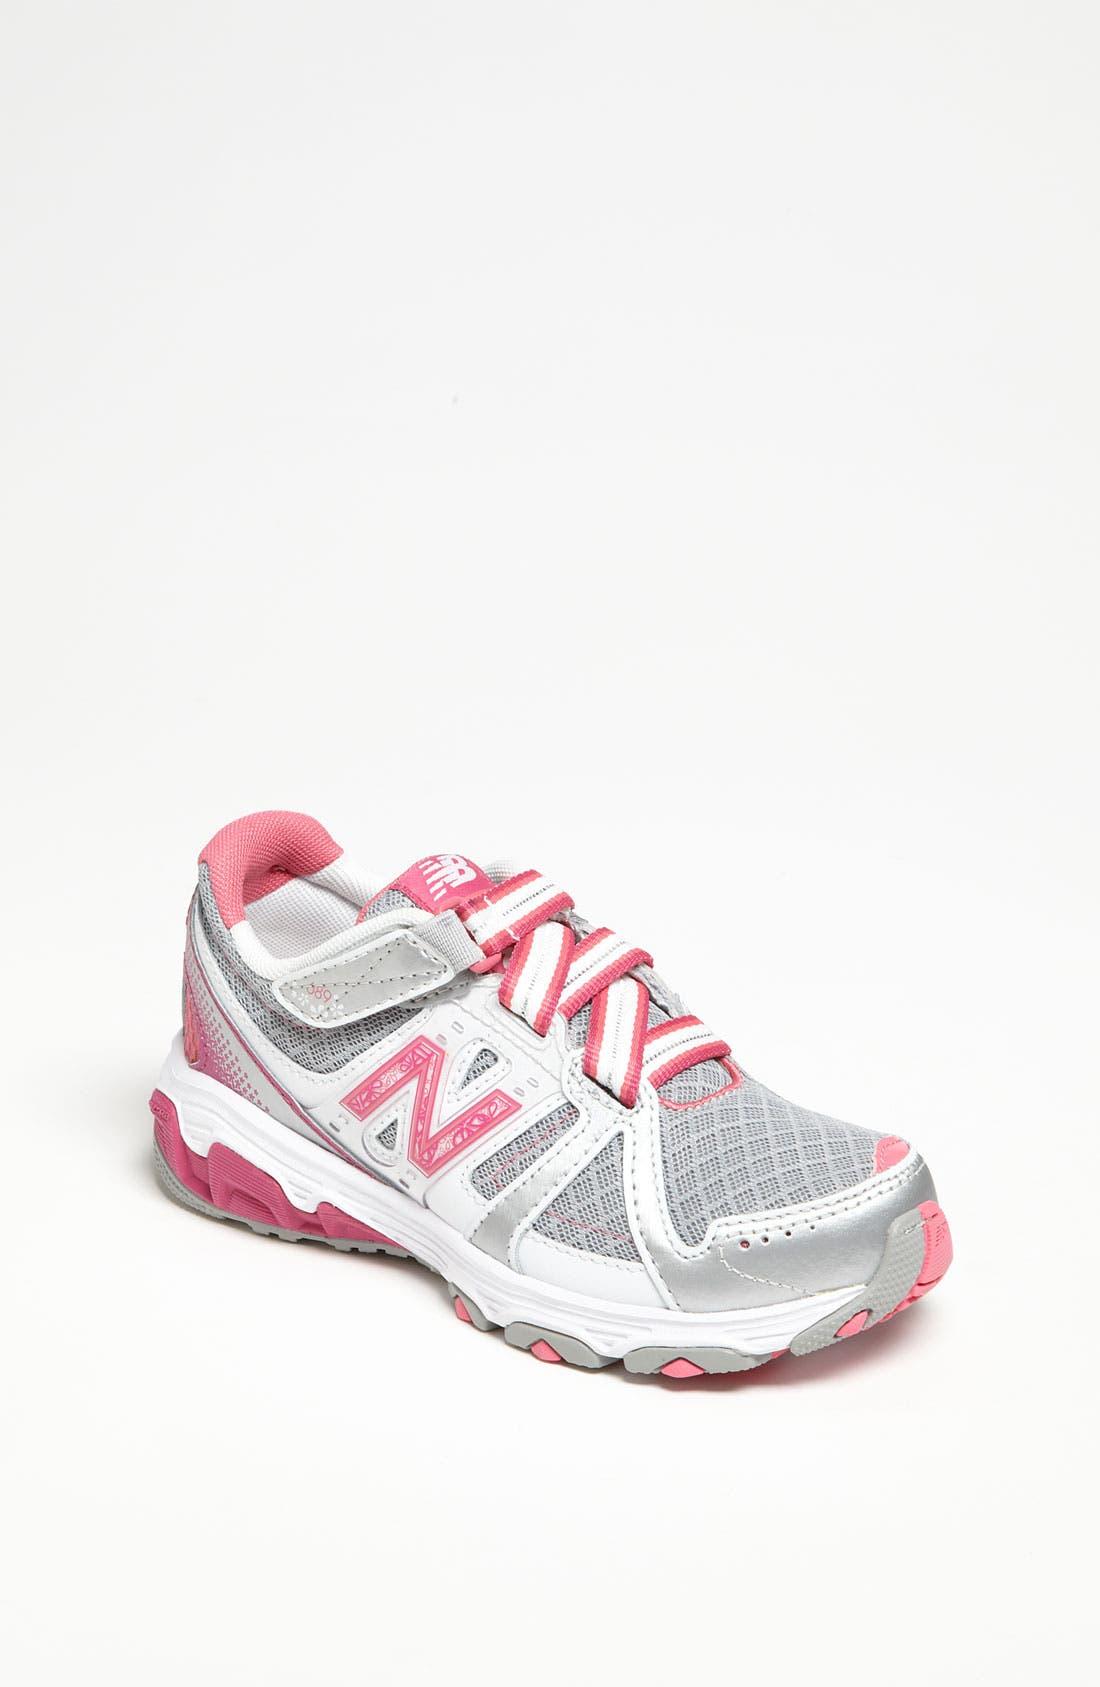 Alternate Image 1 Selected - New Balance '689' Running Shoe (Baby, Walker, Toddler, Little Kid & Big Kid)